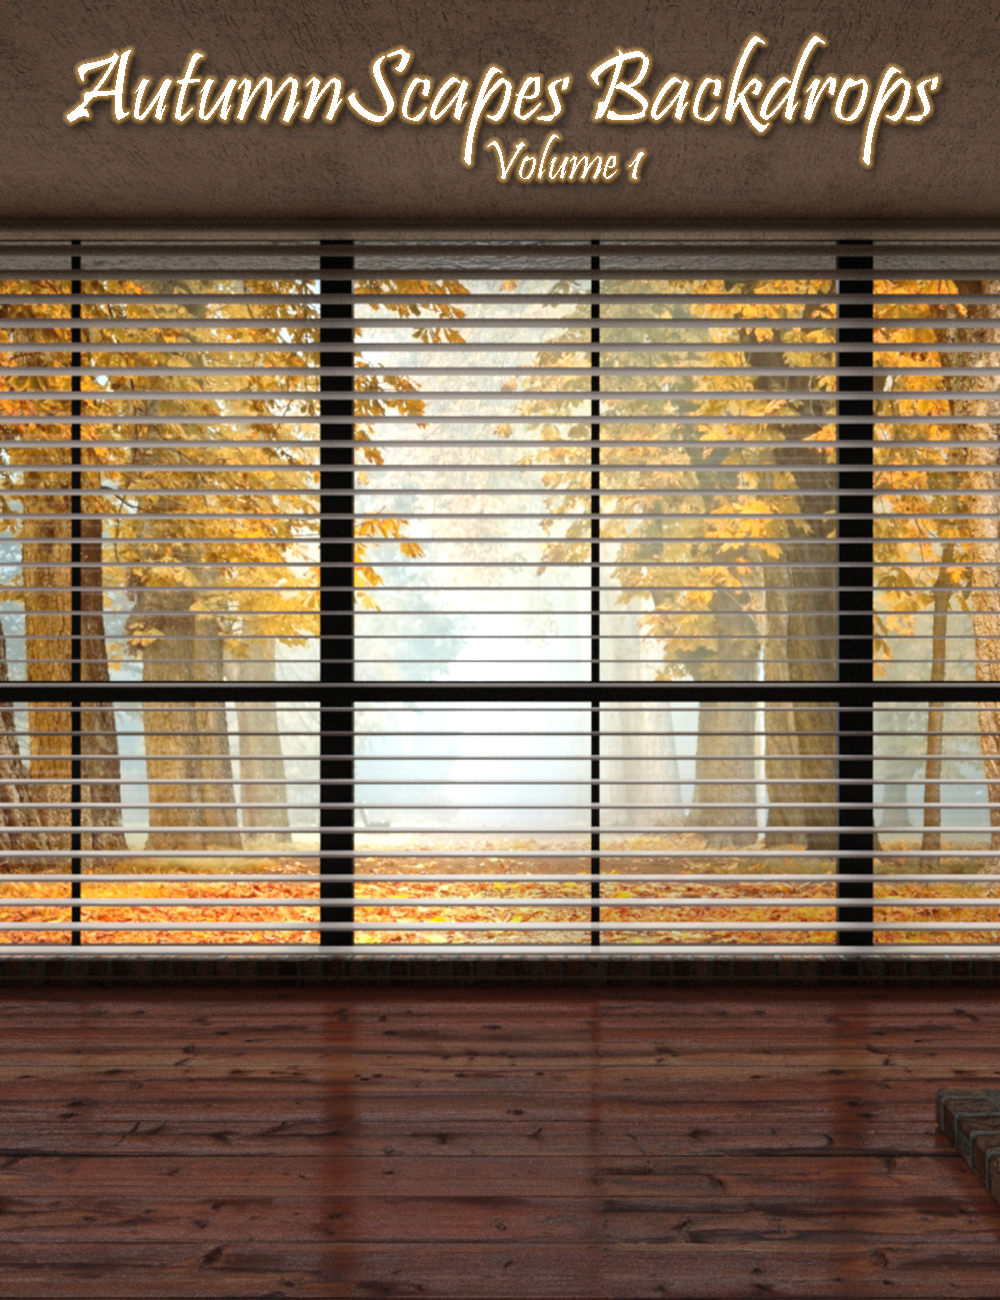 AutumnScapes Backdrops Volume 1 by: IlluminationImagineX, 3D Models by Daz 3D